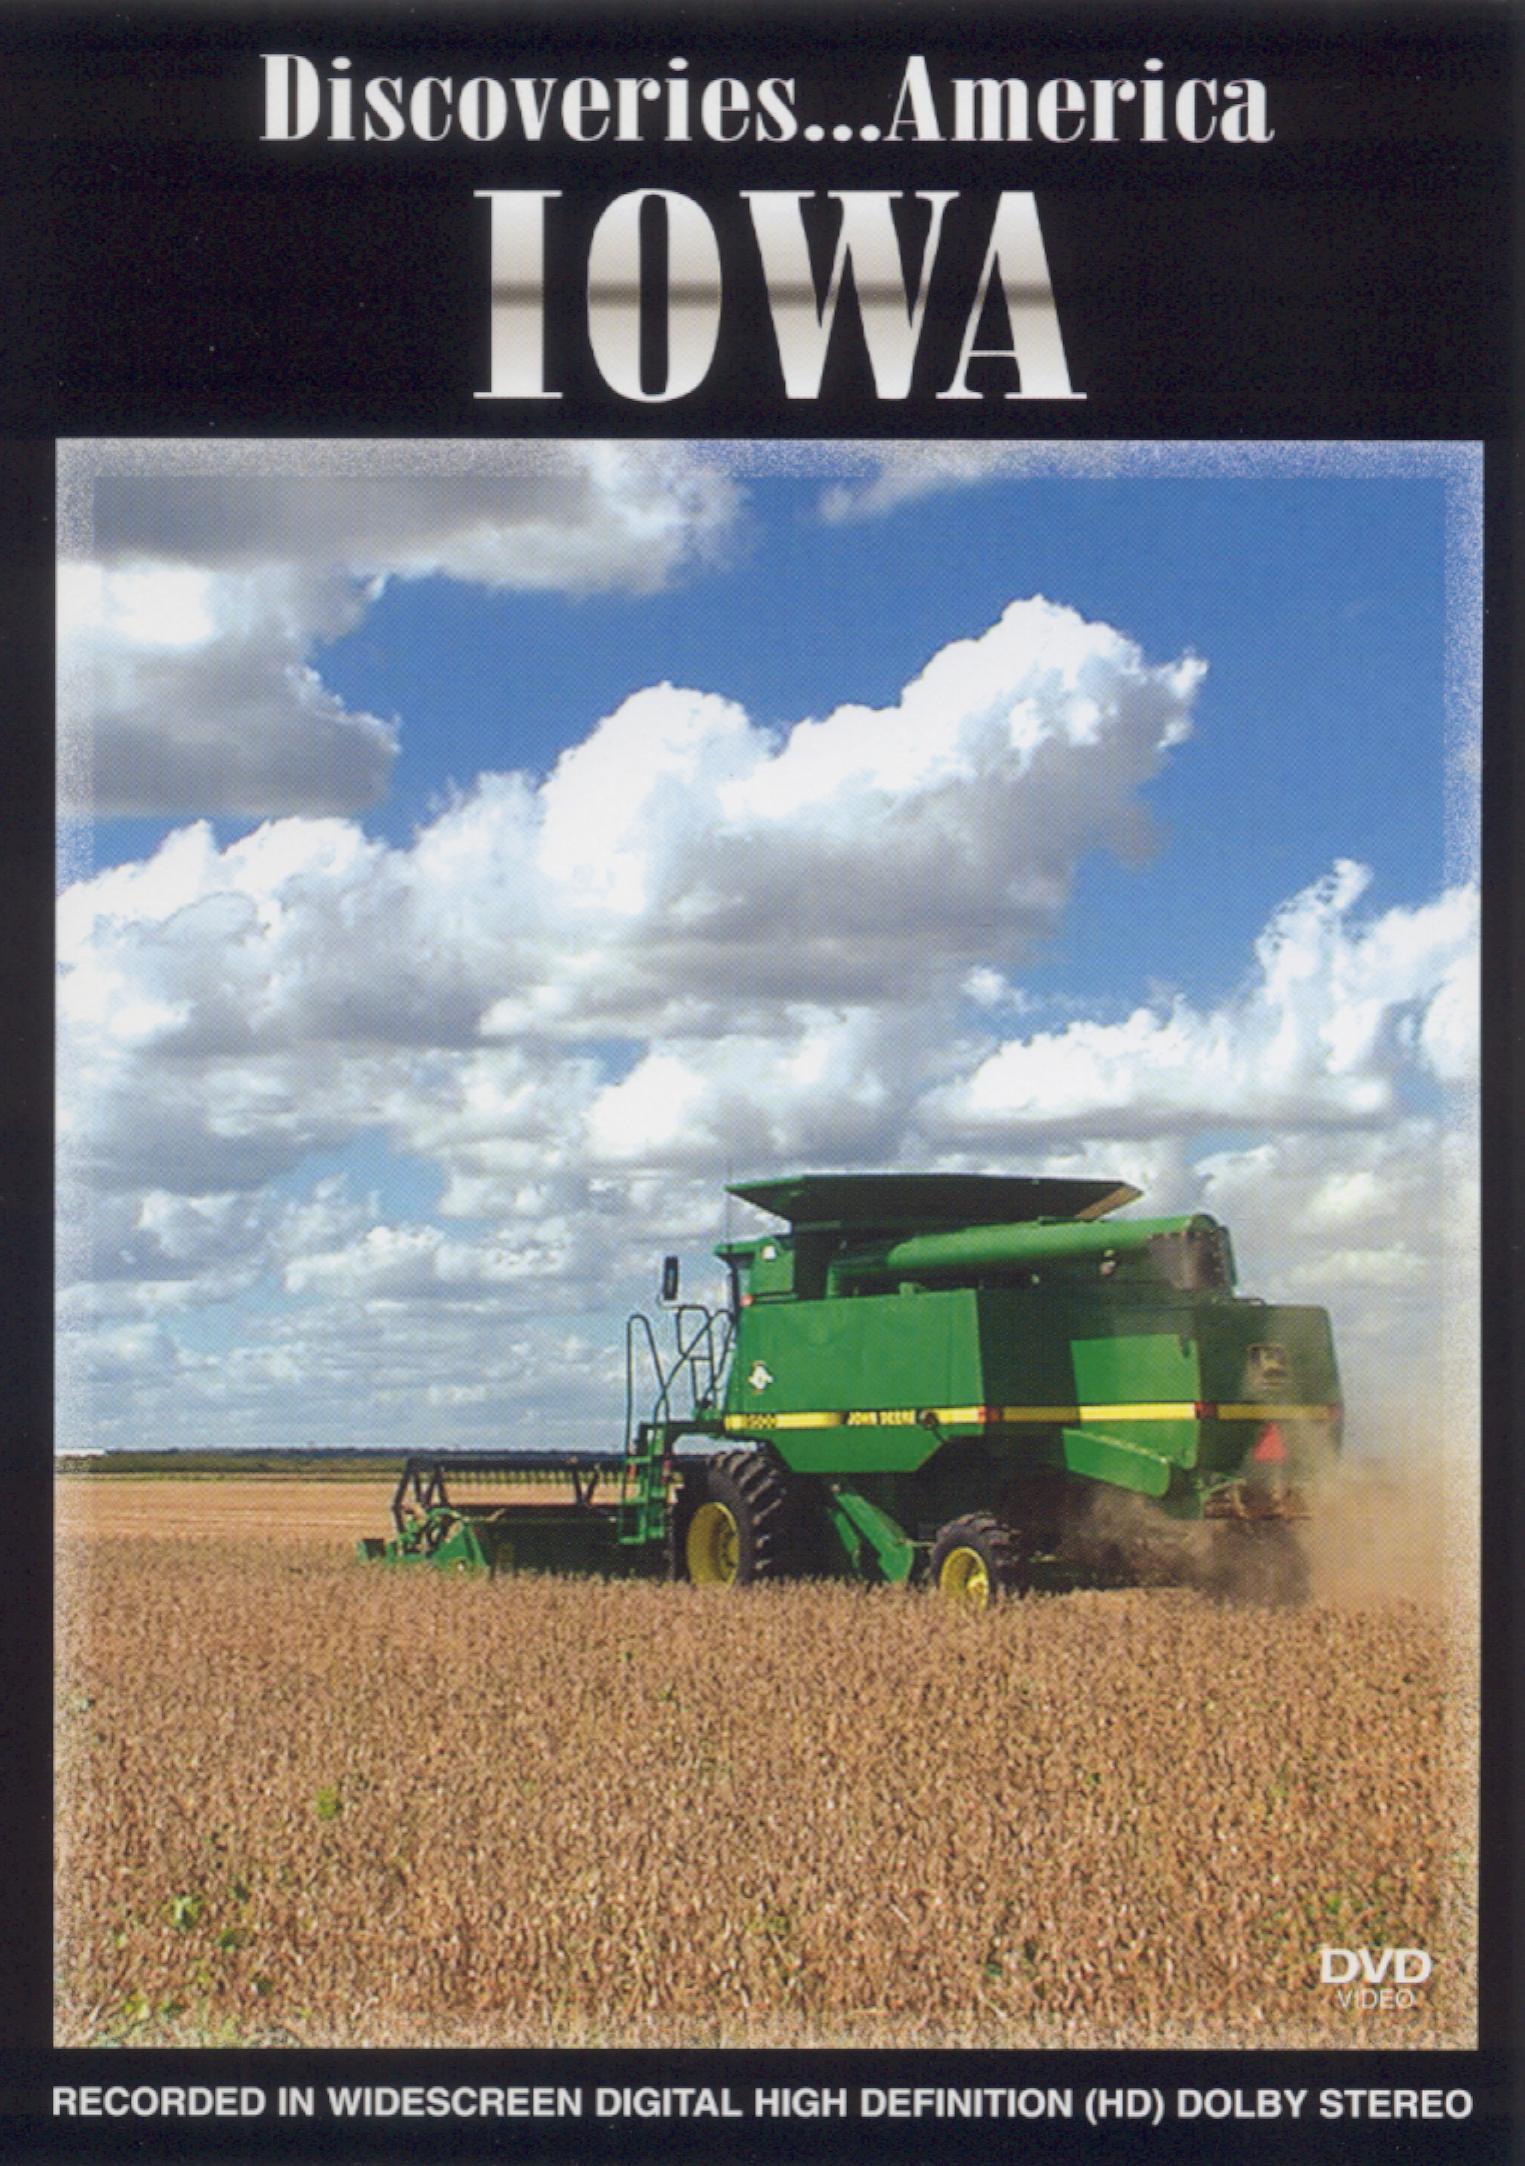 Discoveries... America: Iowa